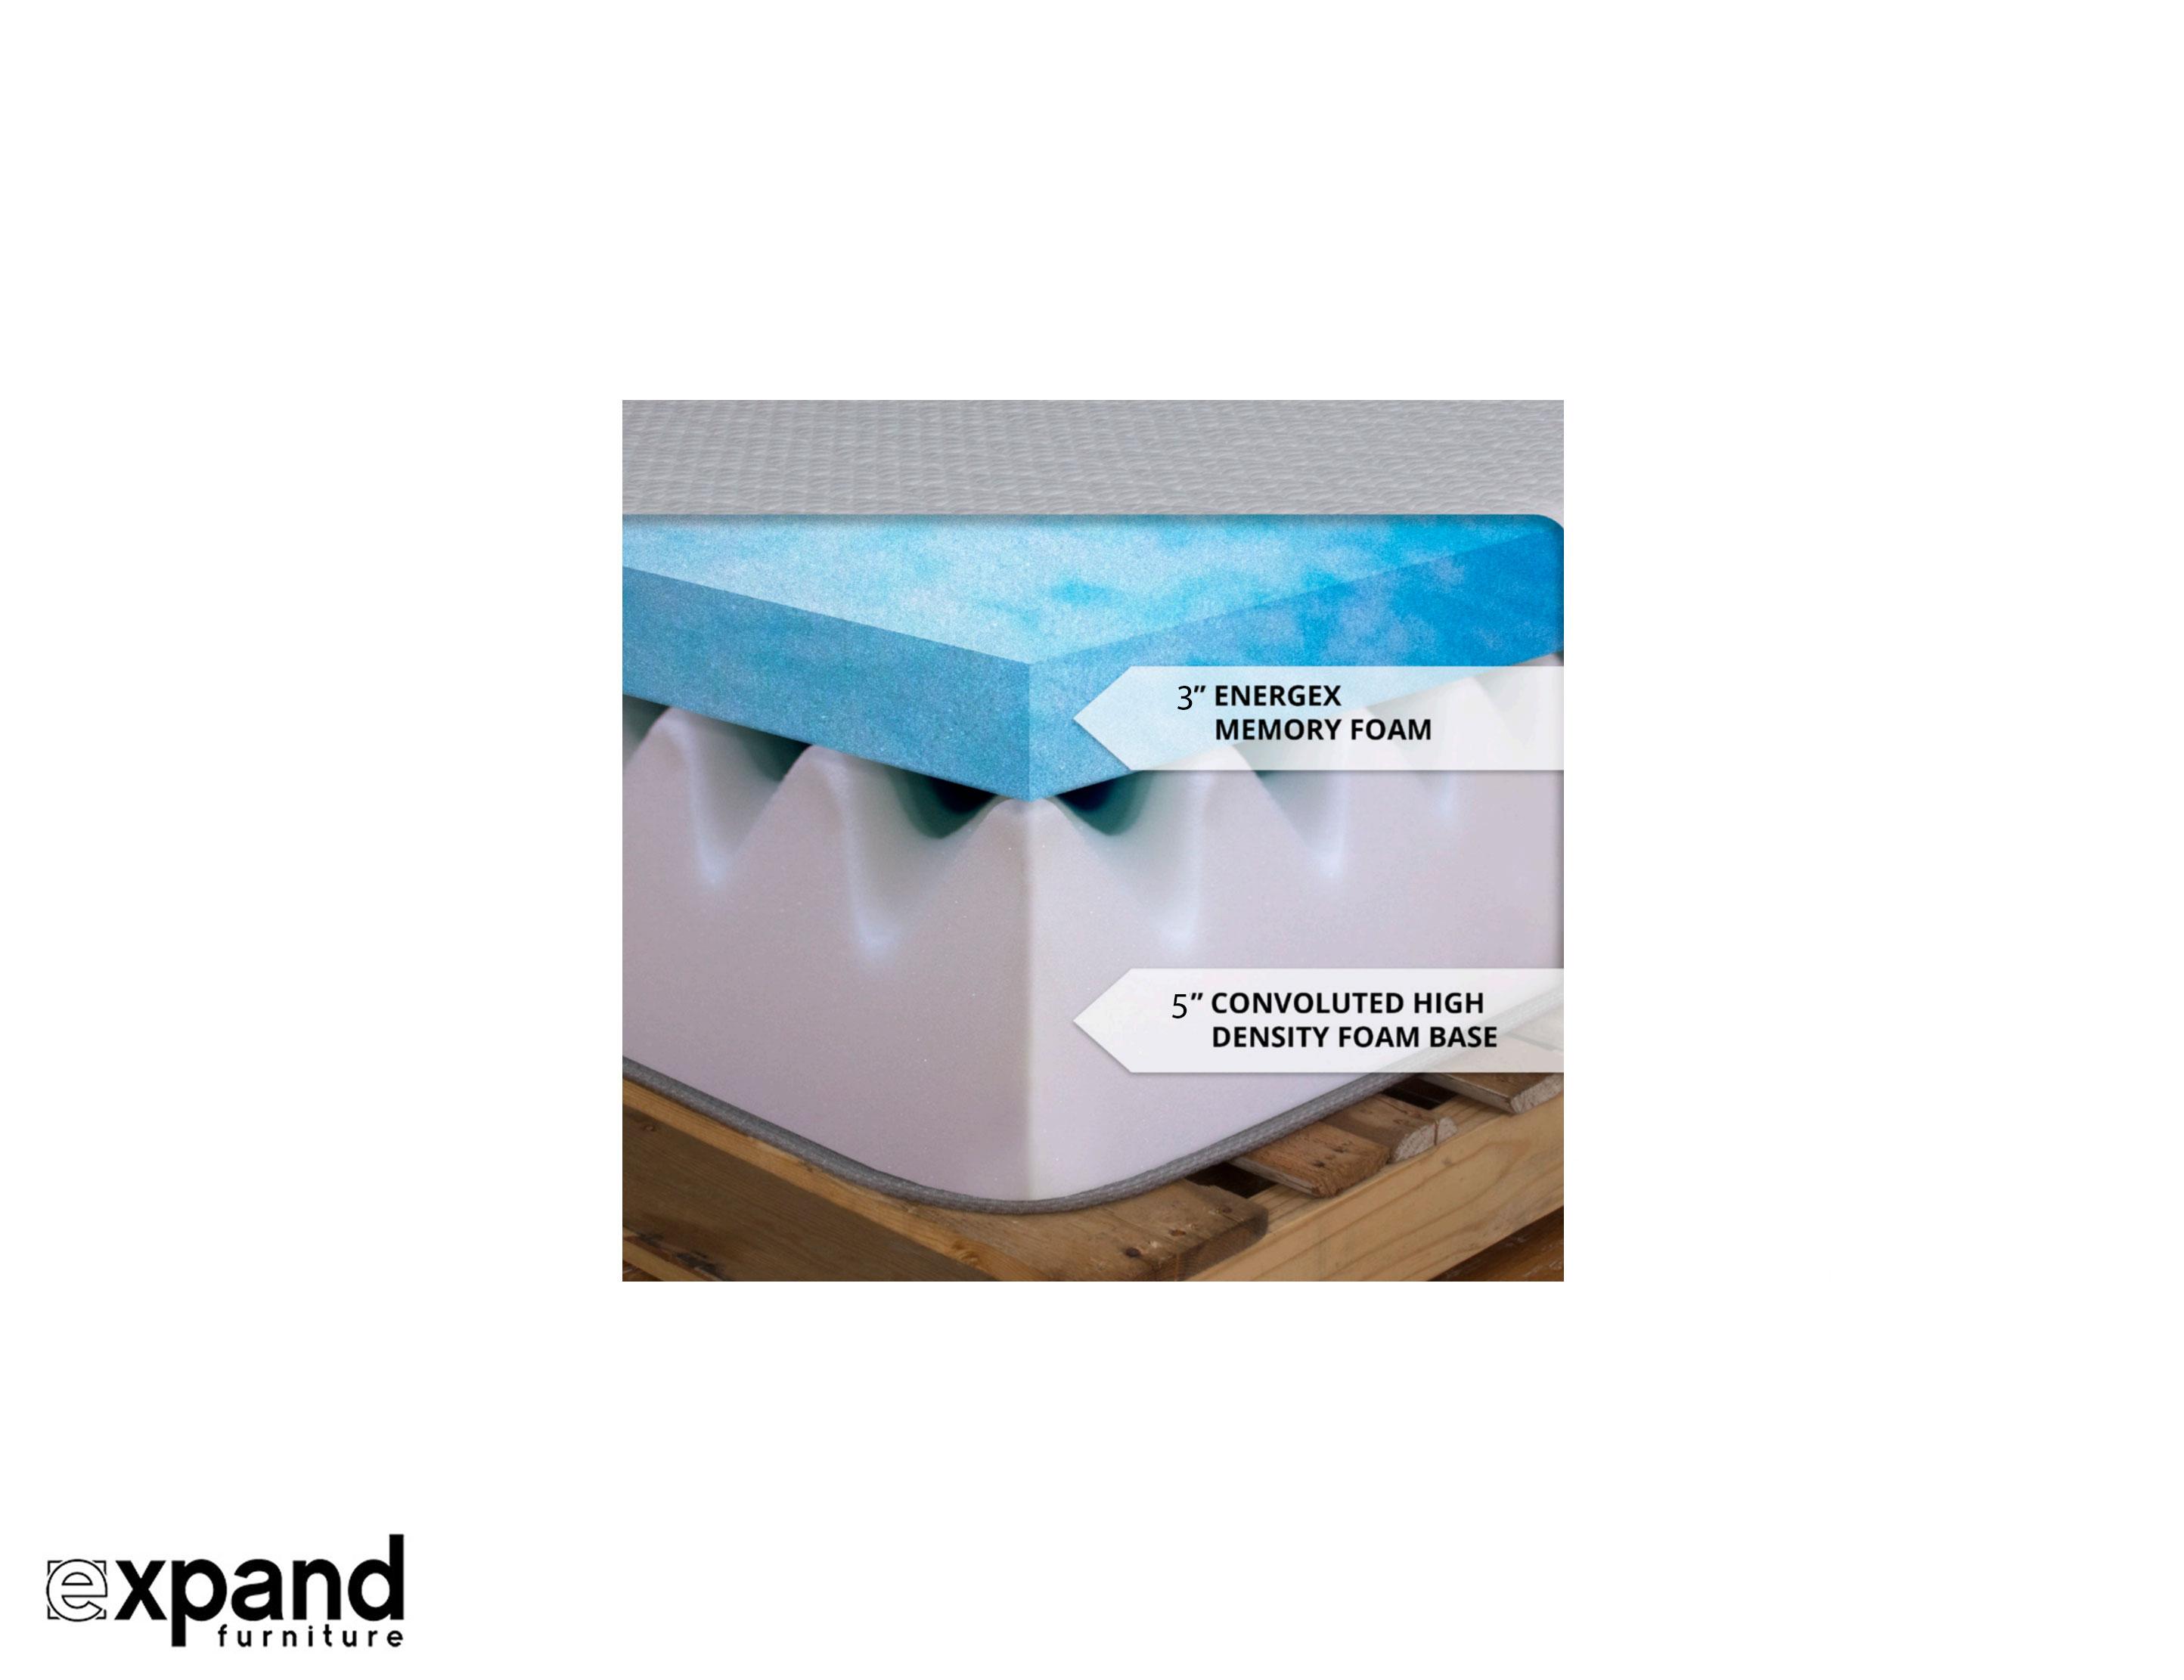 Expand 8 Inch Gel infused Memory Foam Mattress